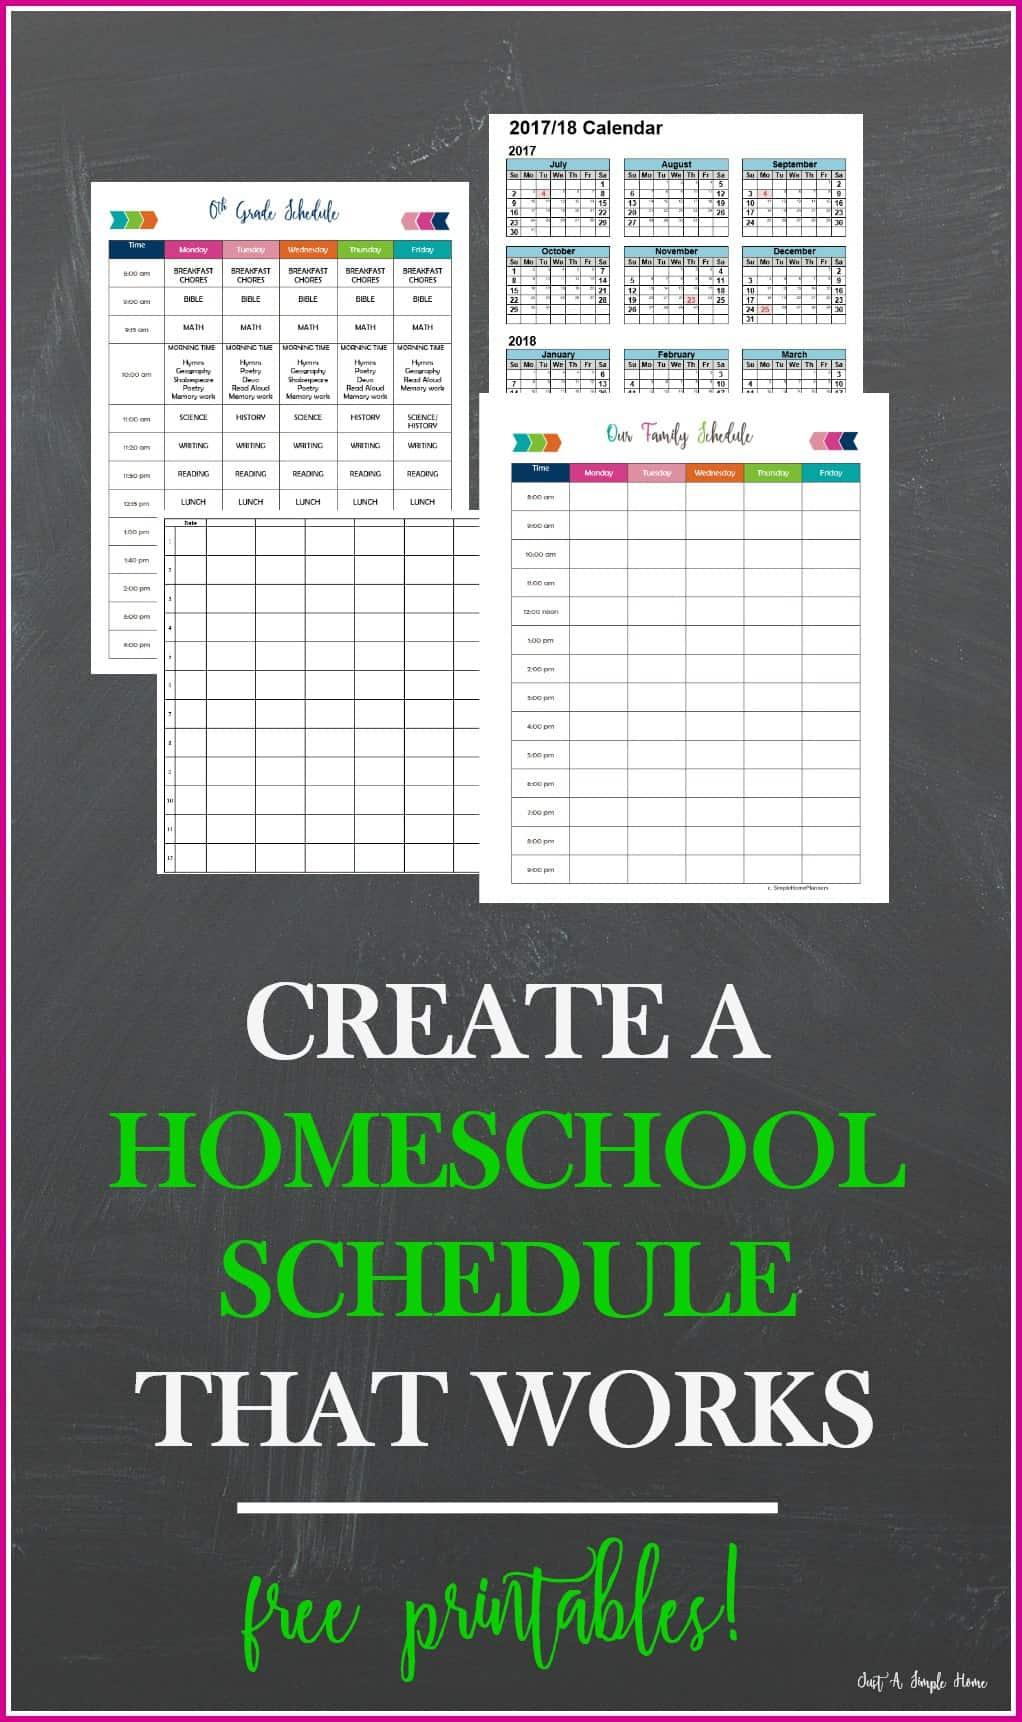 creating a homeschool schedule printable